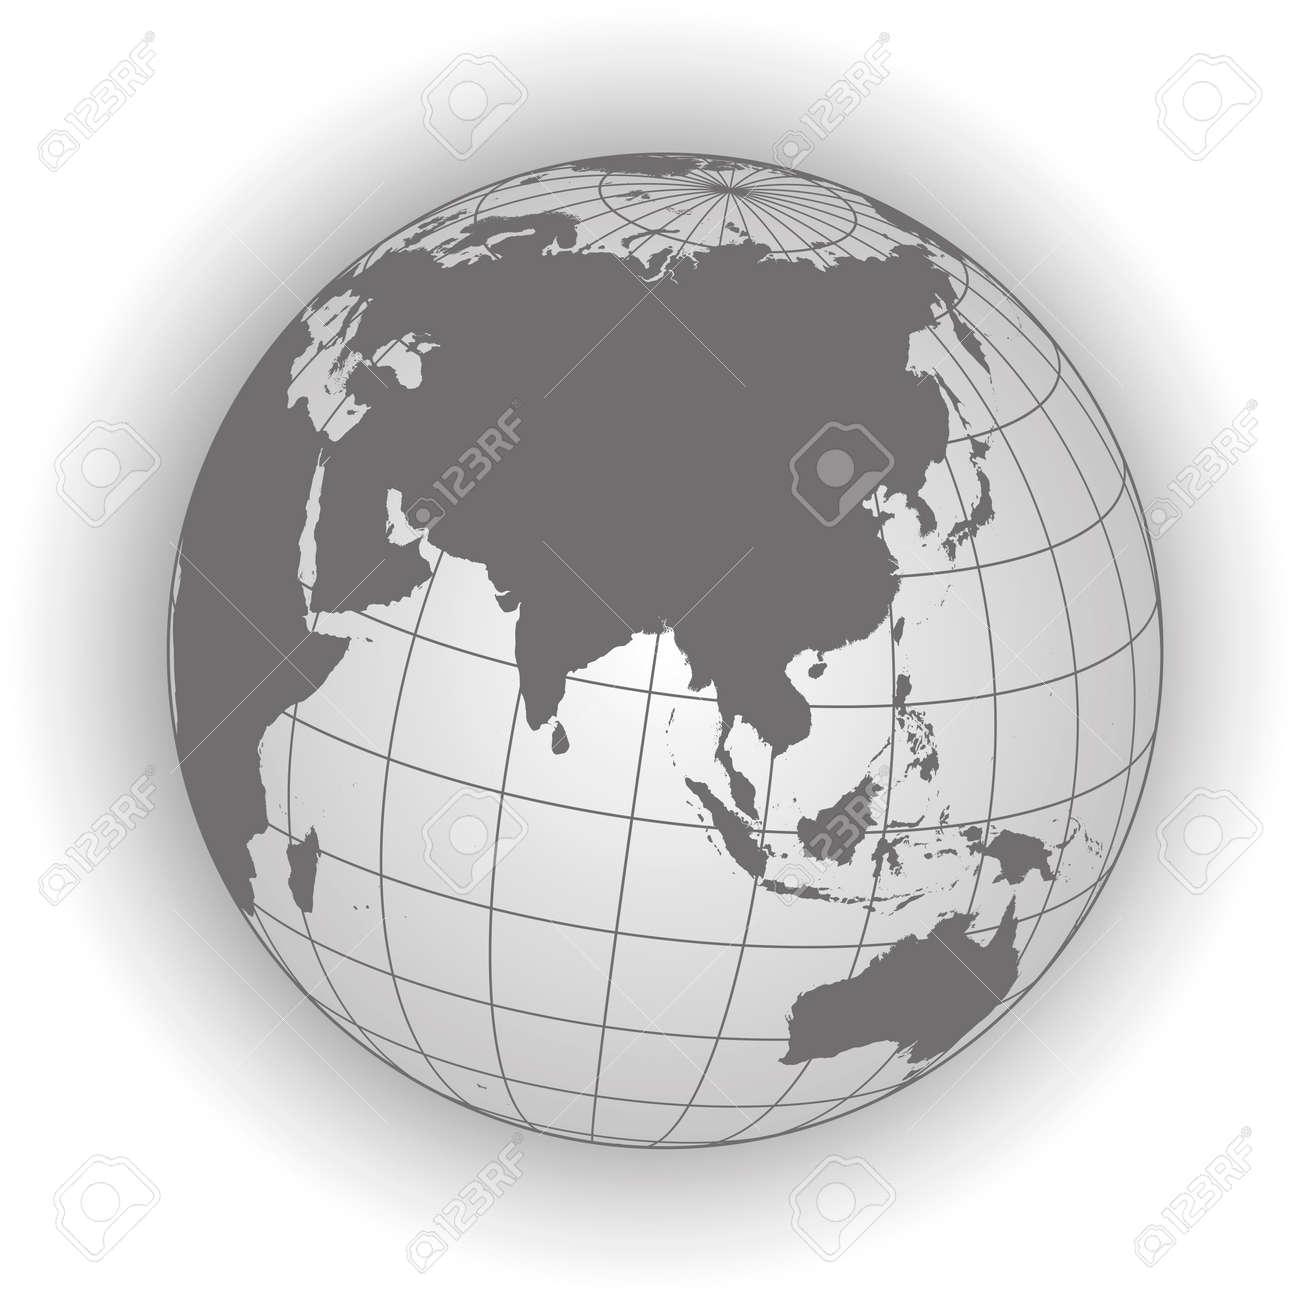 Asia map australia russia africa north pole earth globe asia map australia russia africa north pole earth globe worldmap gumiabroncs Choice Image